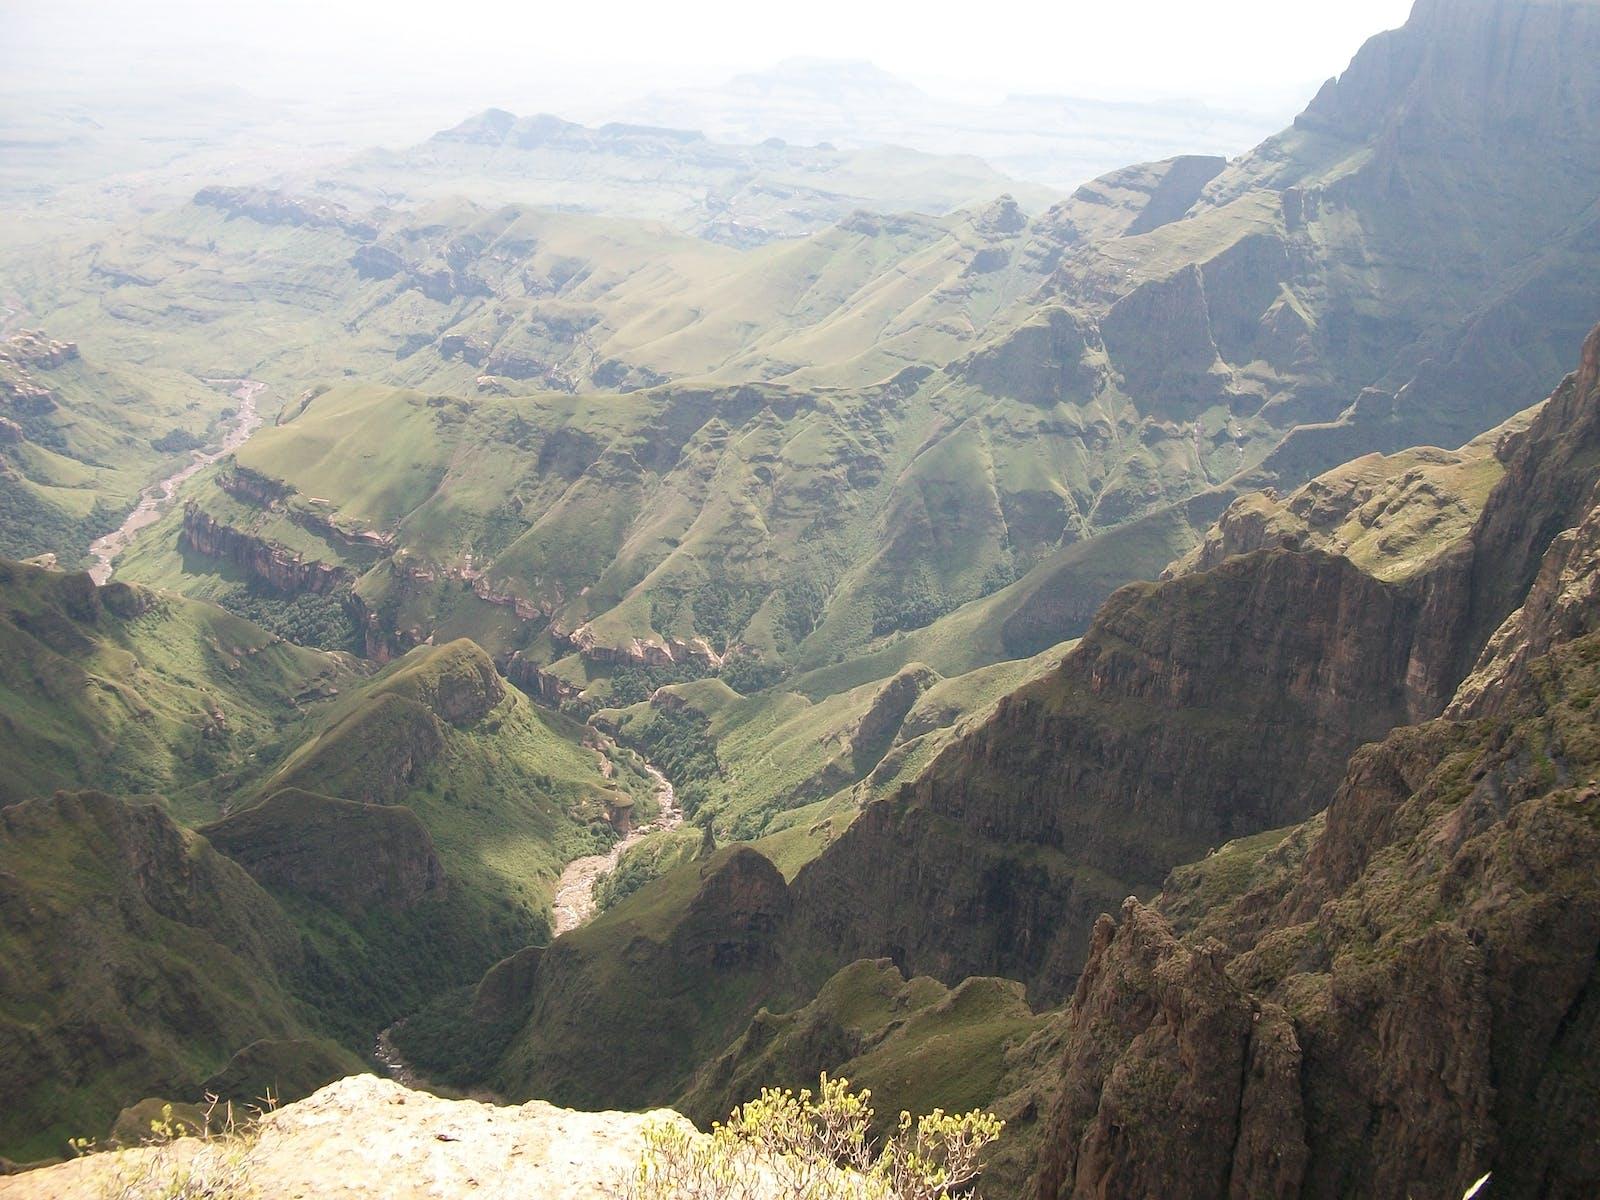 Drakensberg Escarpment Savanna and Thicket